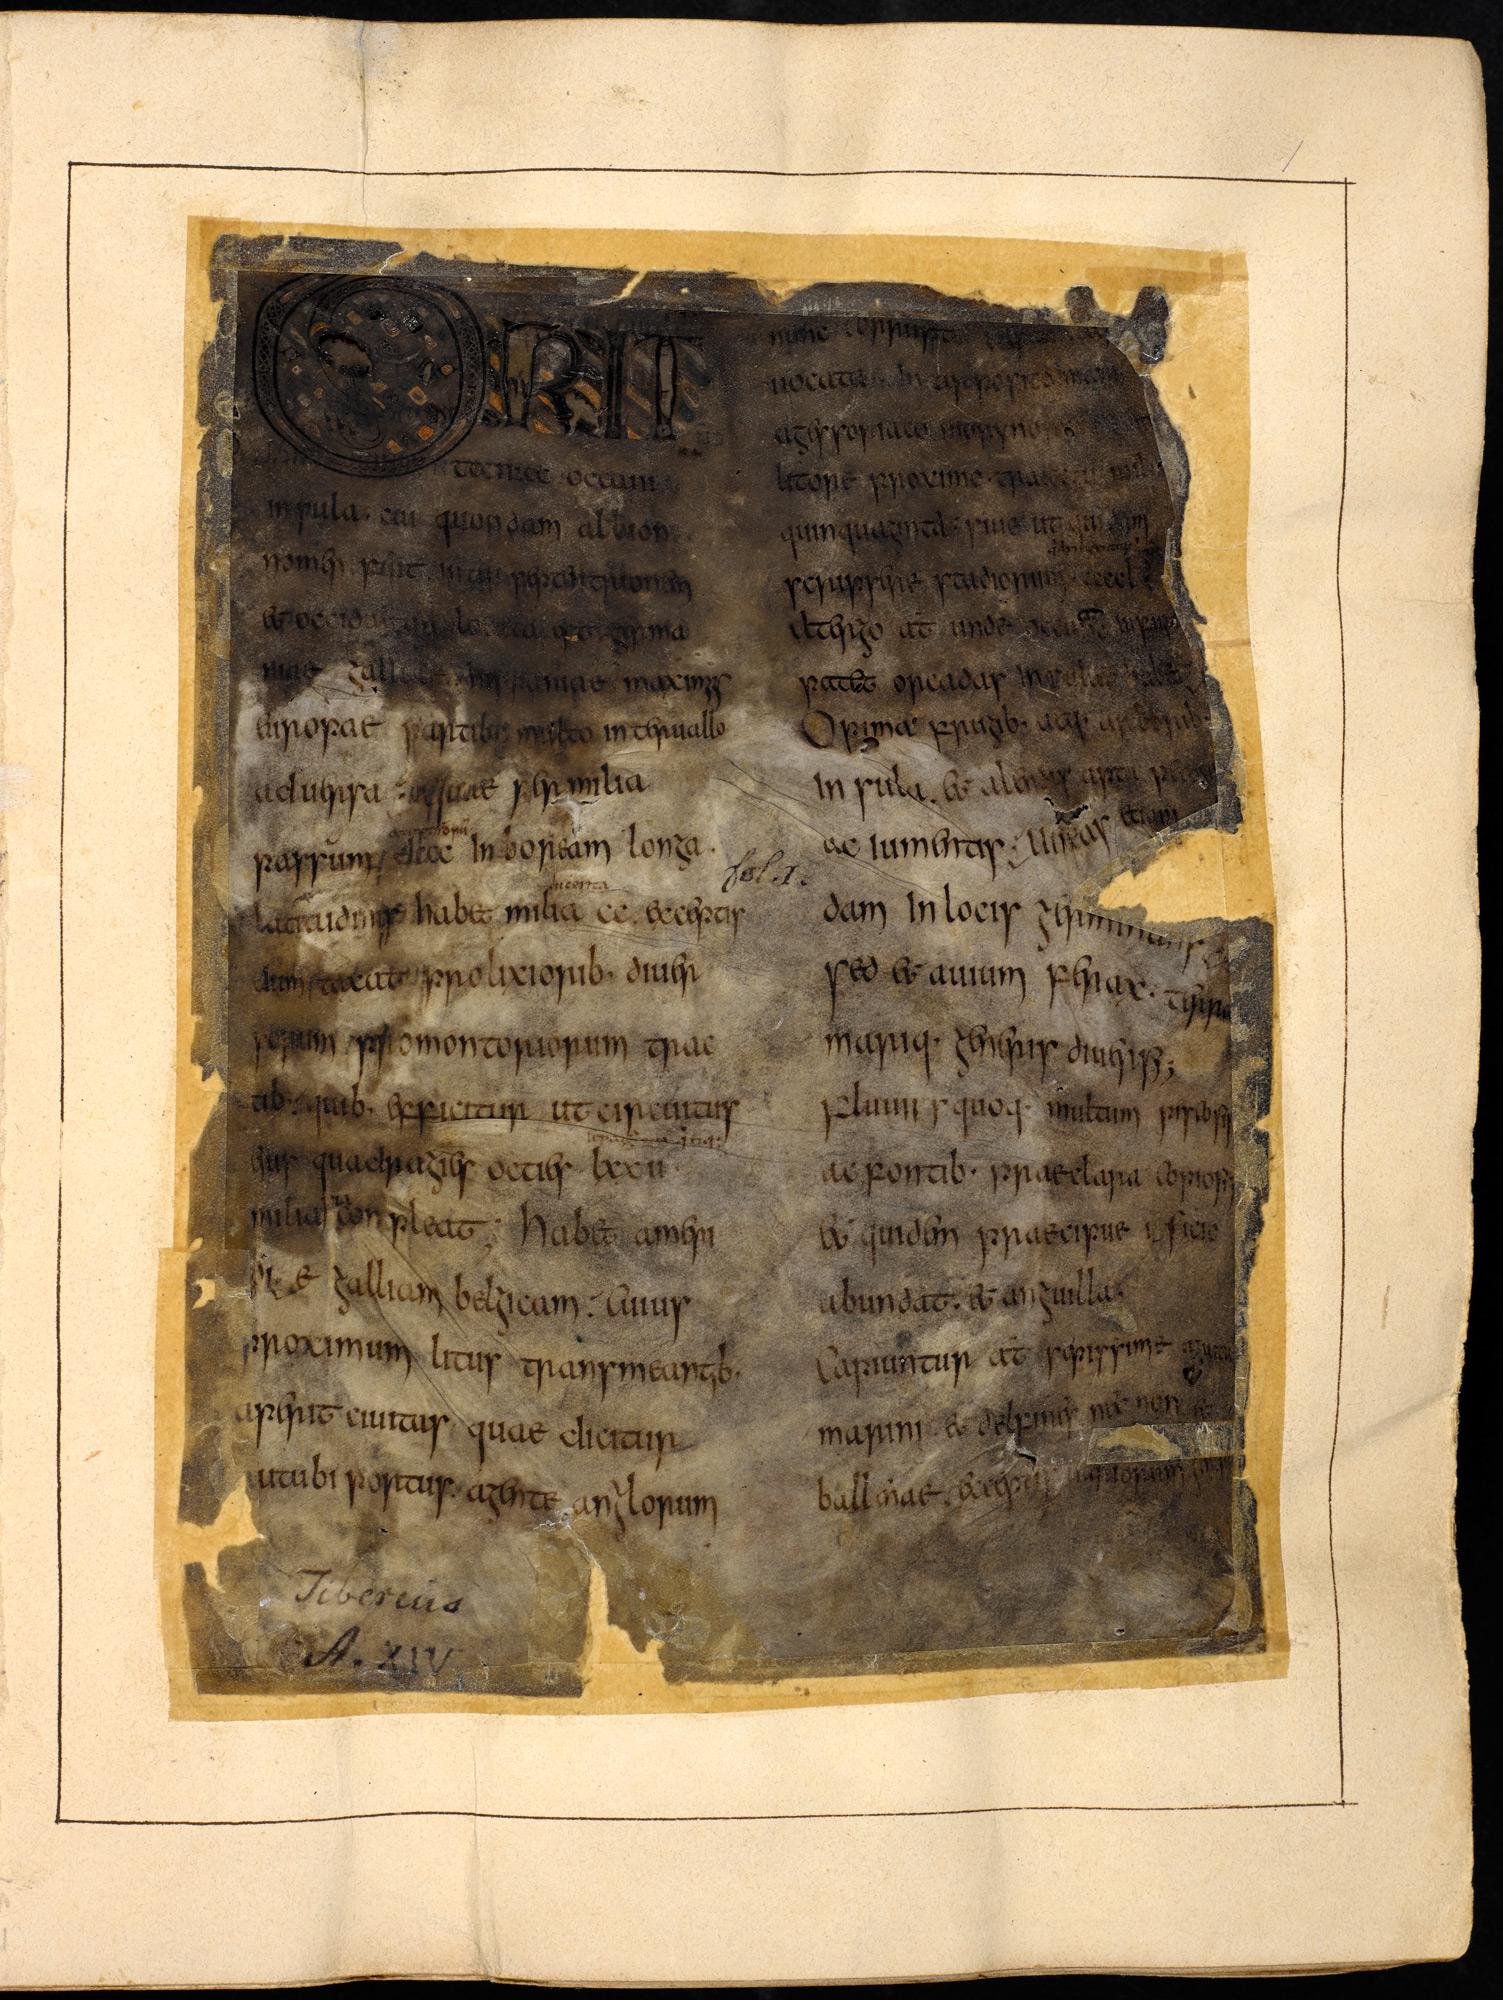 Caedmon's Hymn - The British Library